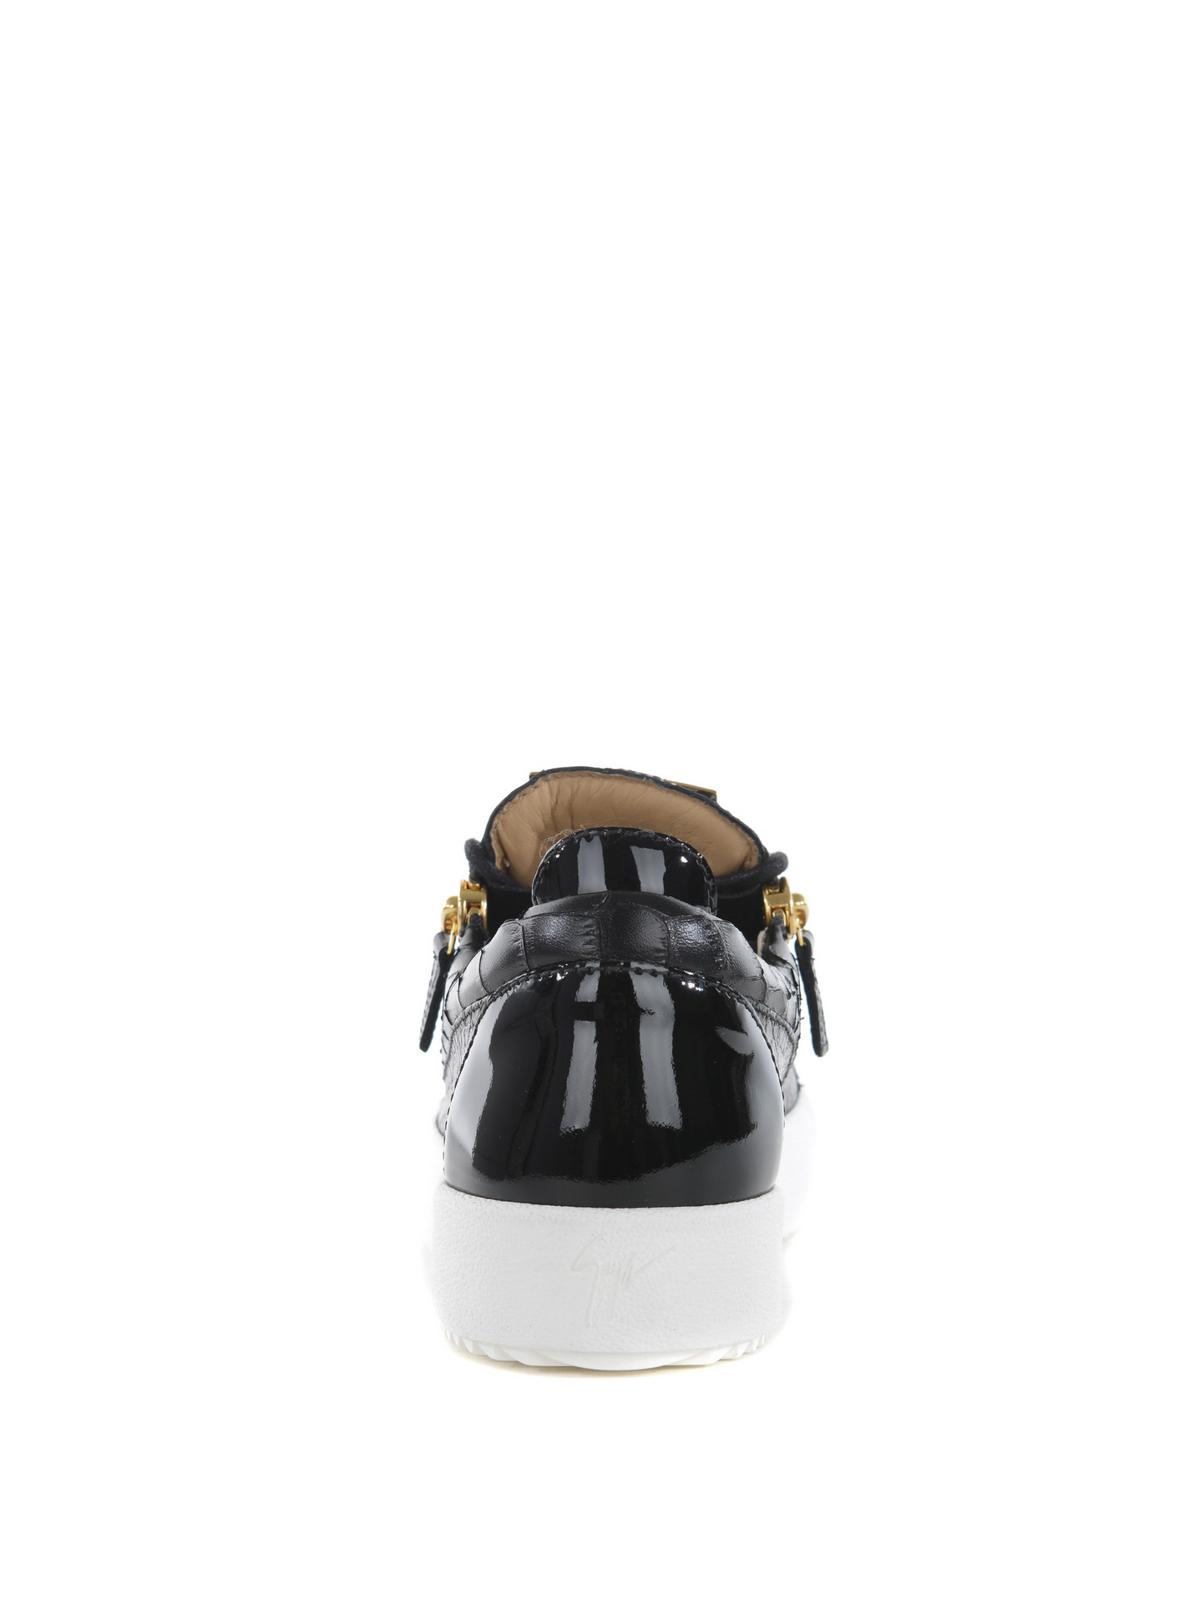 74ad6197763e9 Giuseppe Zanotti - May London croco print sneakers - trainers ...